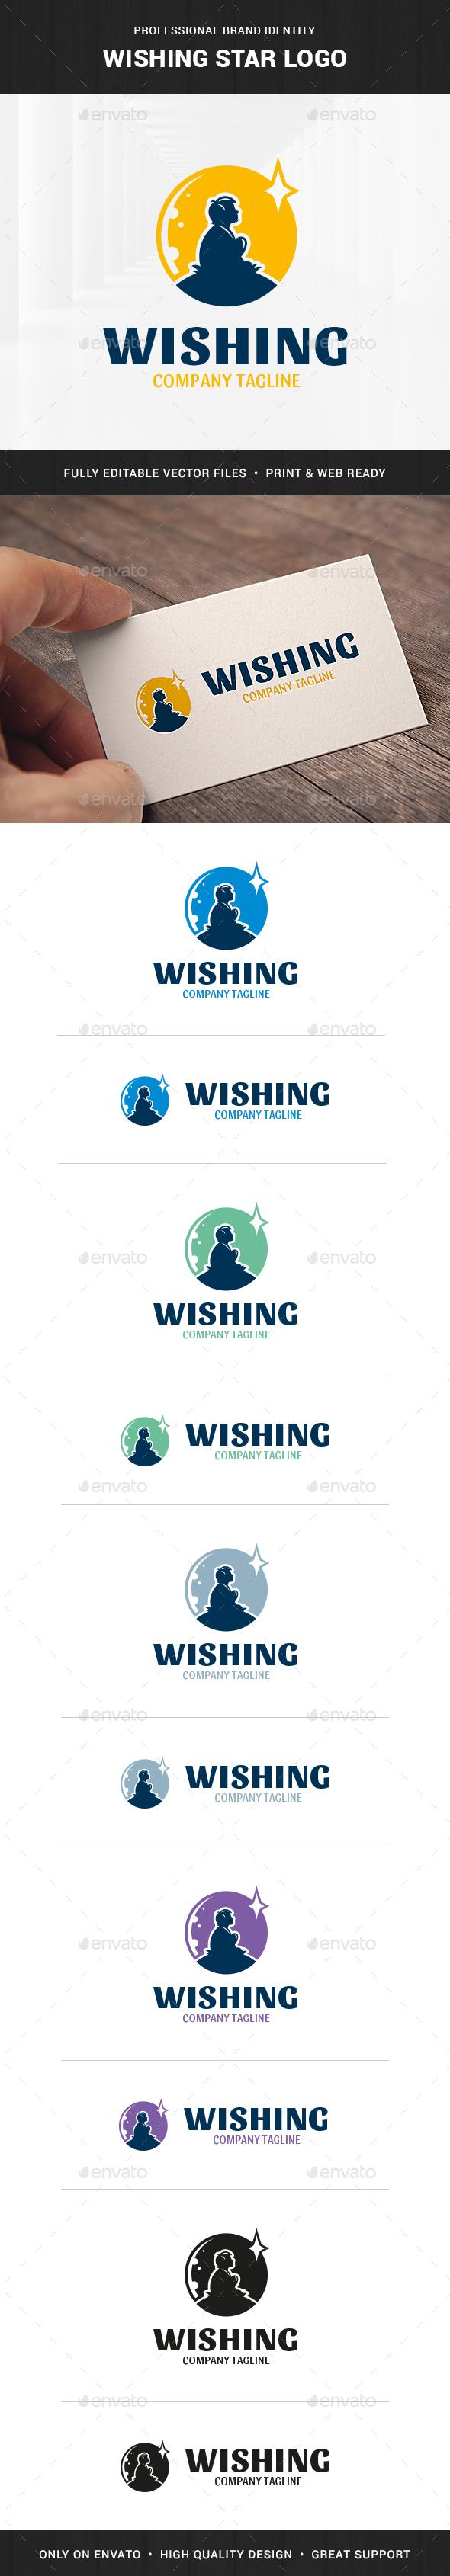 Wishing Star Logo Template